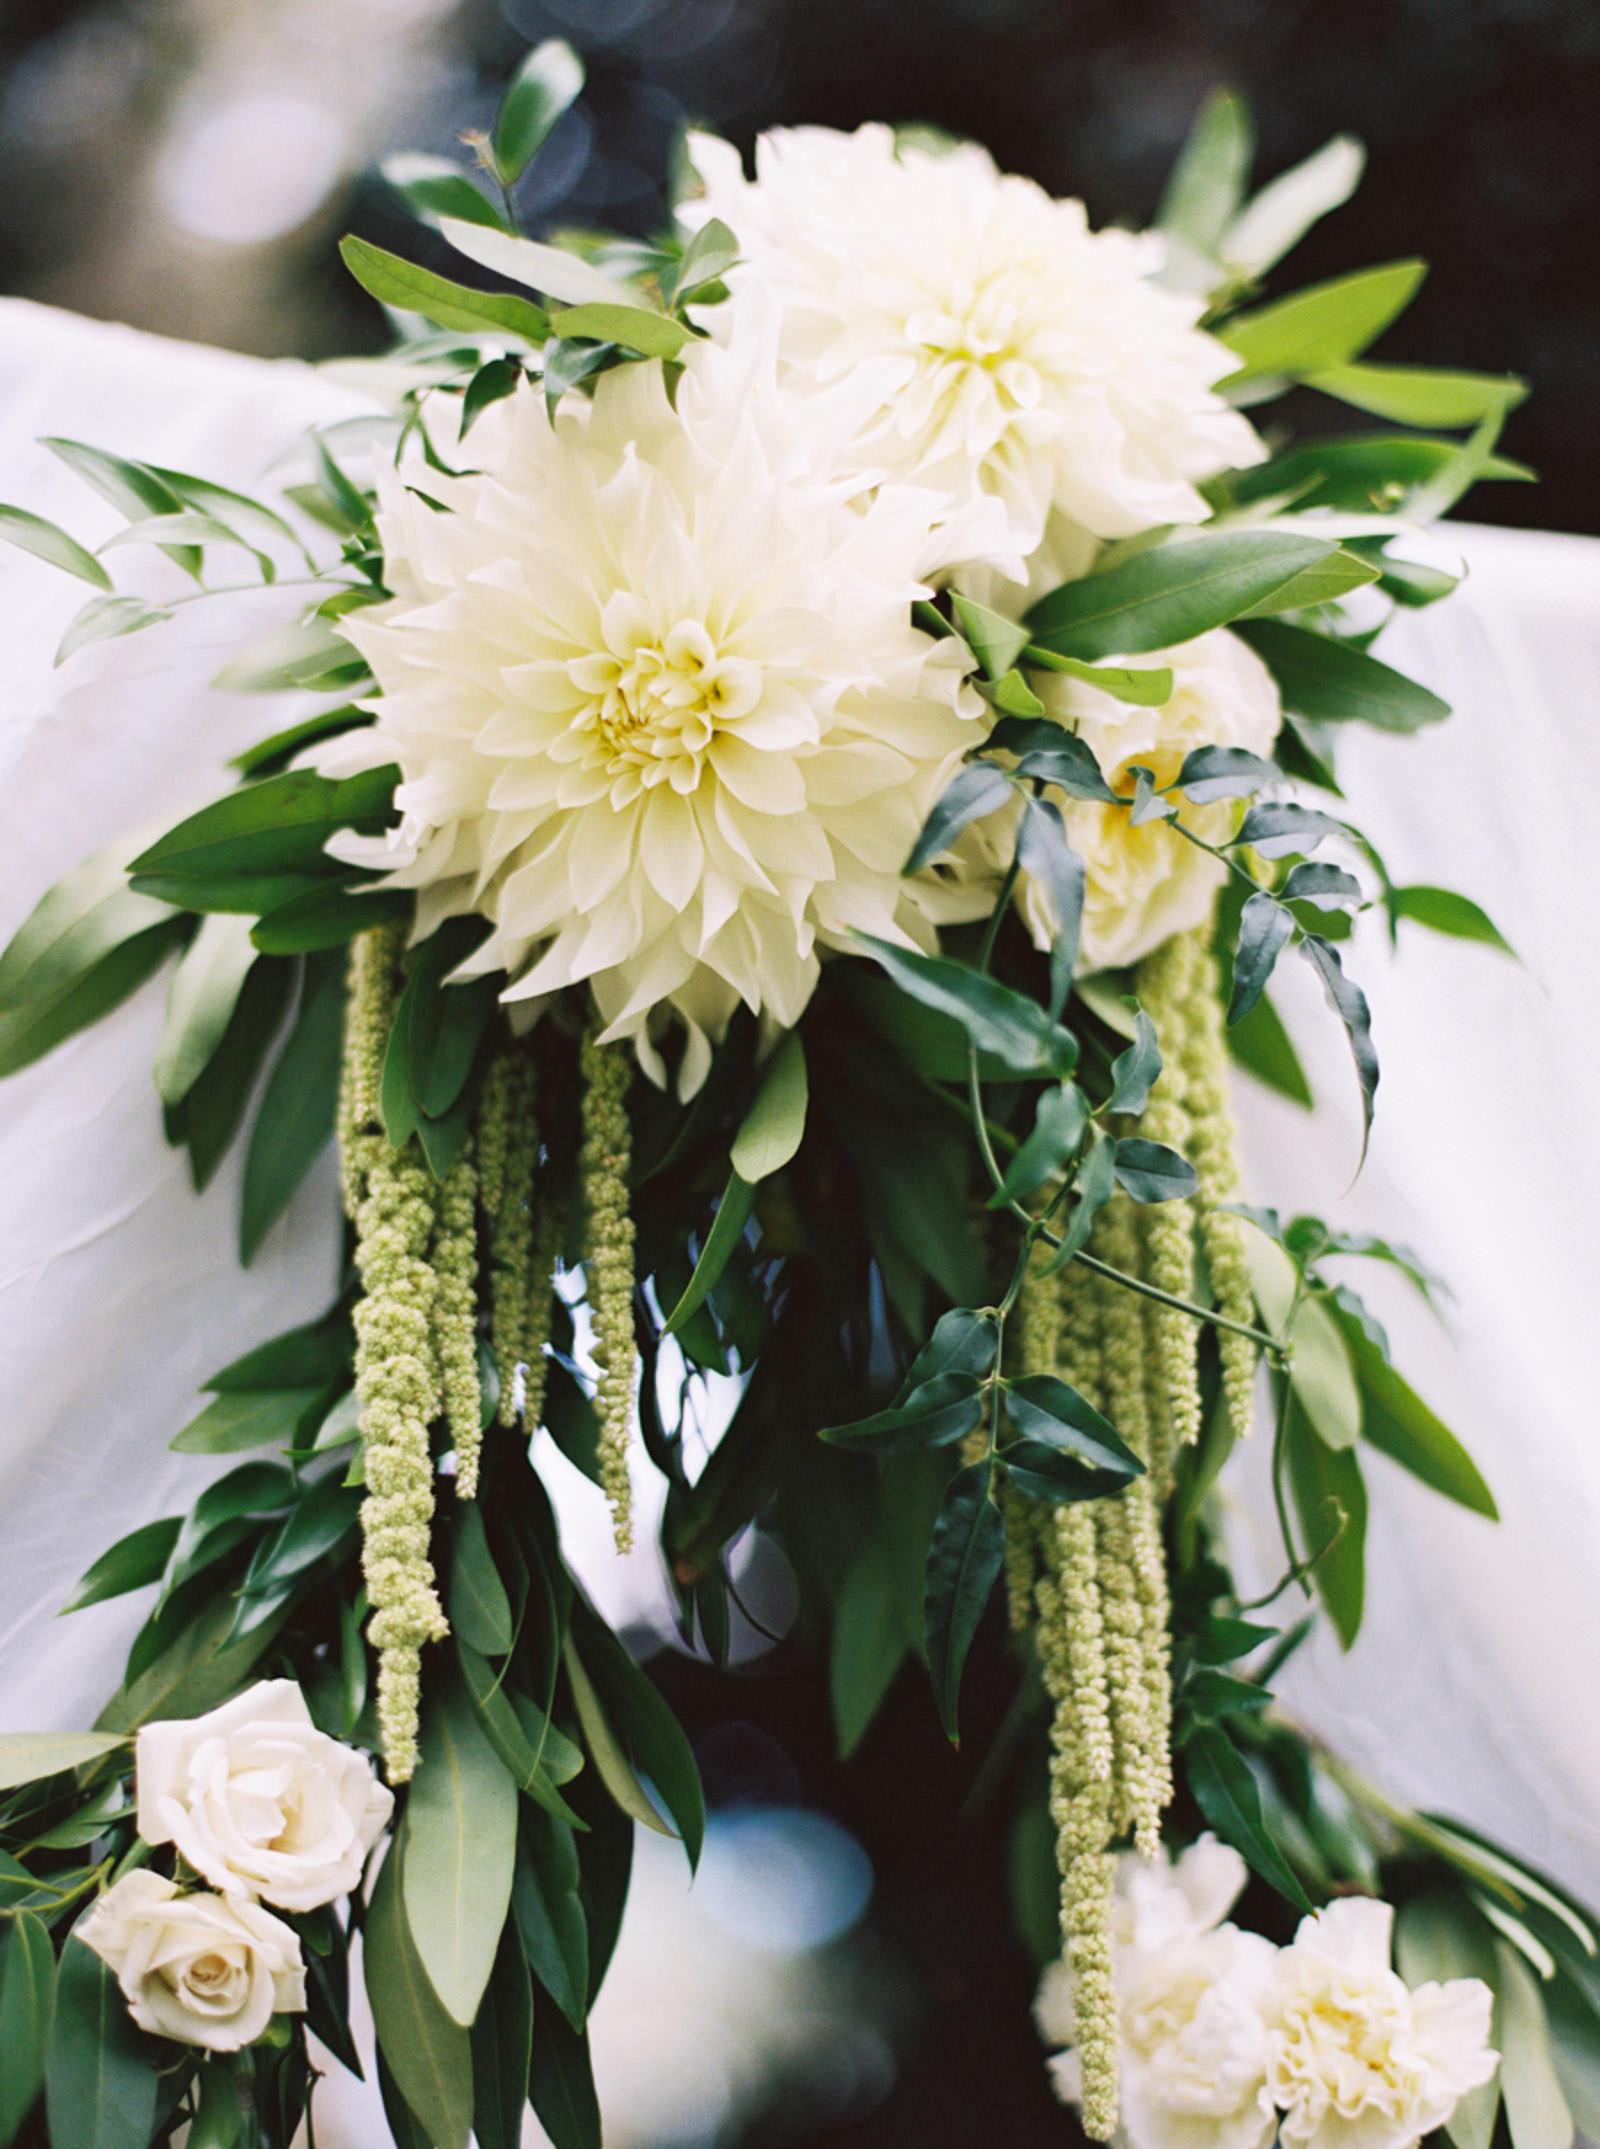 Arbor Crest Winery Wedding Details by Spokane Wedding Photographer Anna Peters